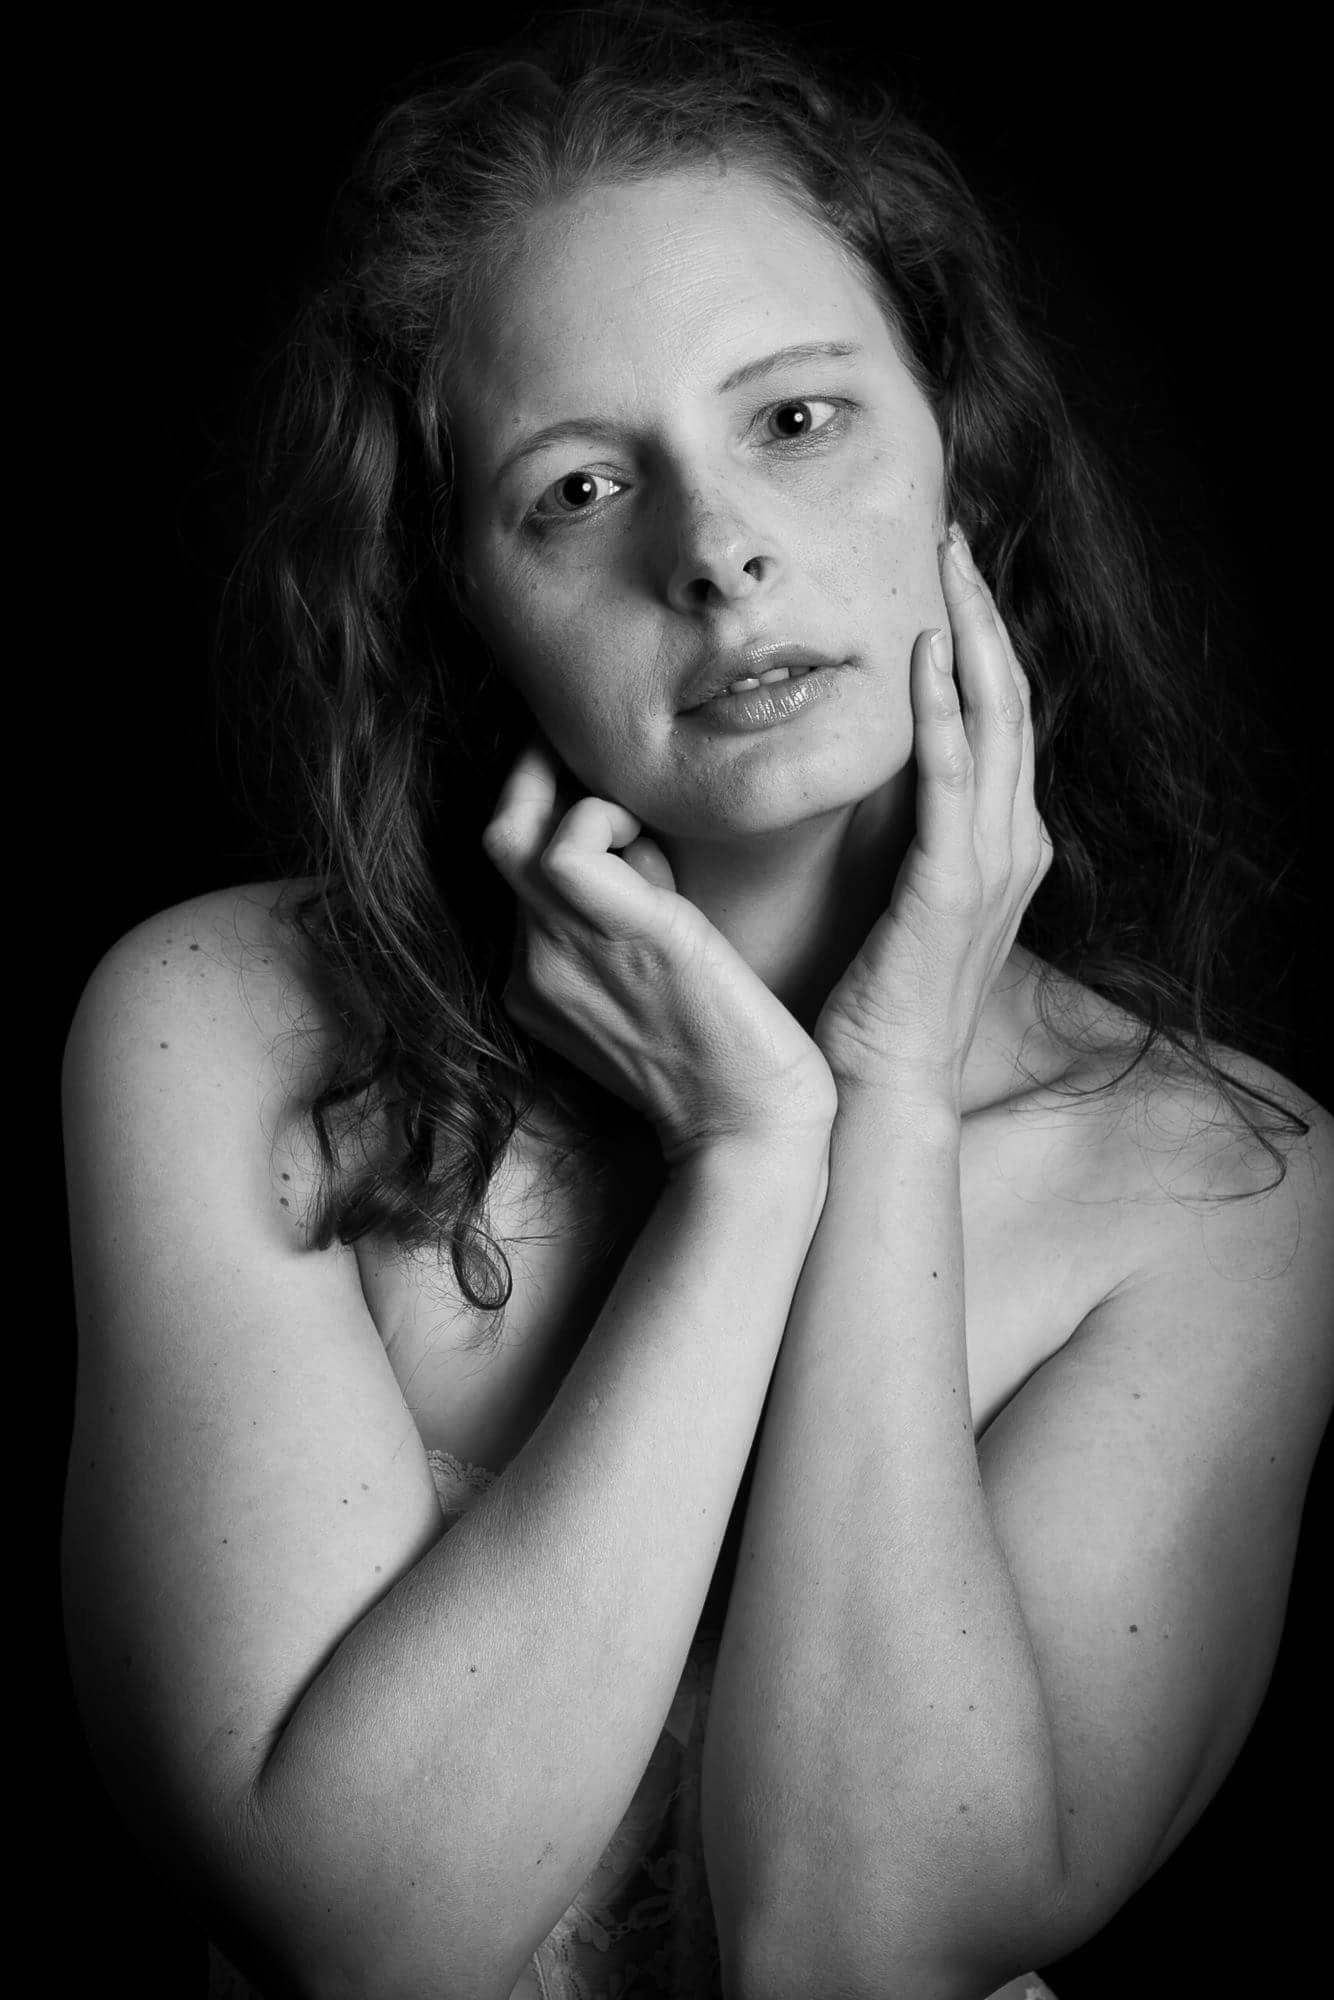 Beth Rolling's Model portfolio